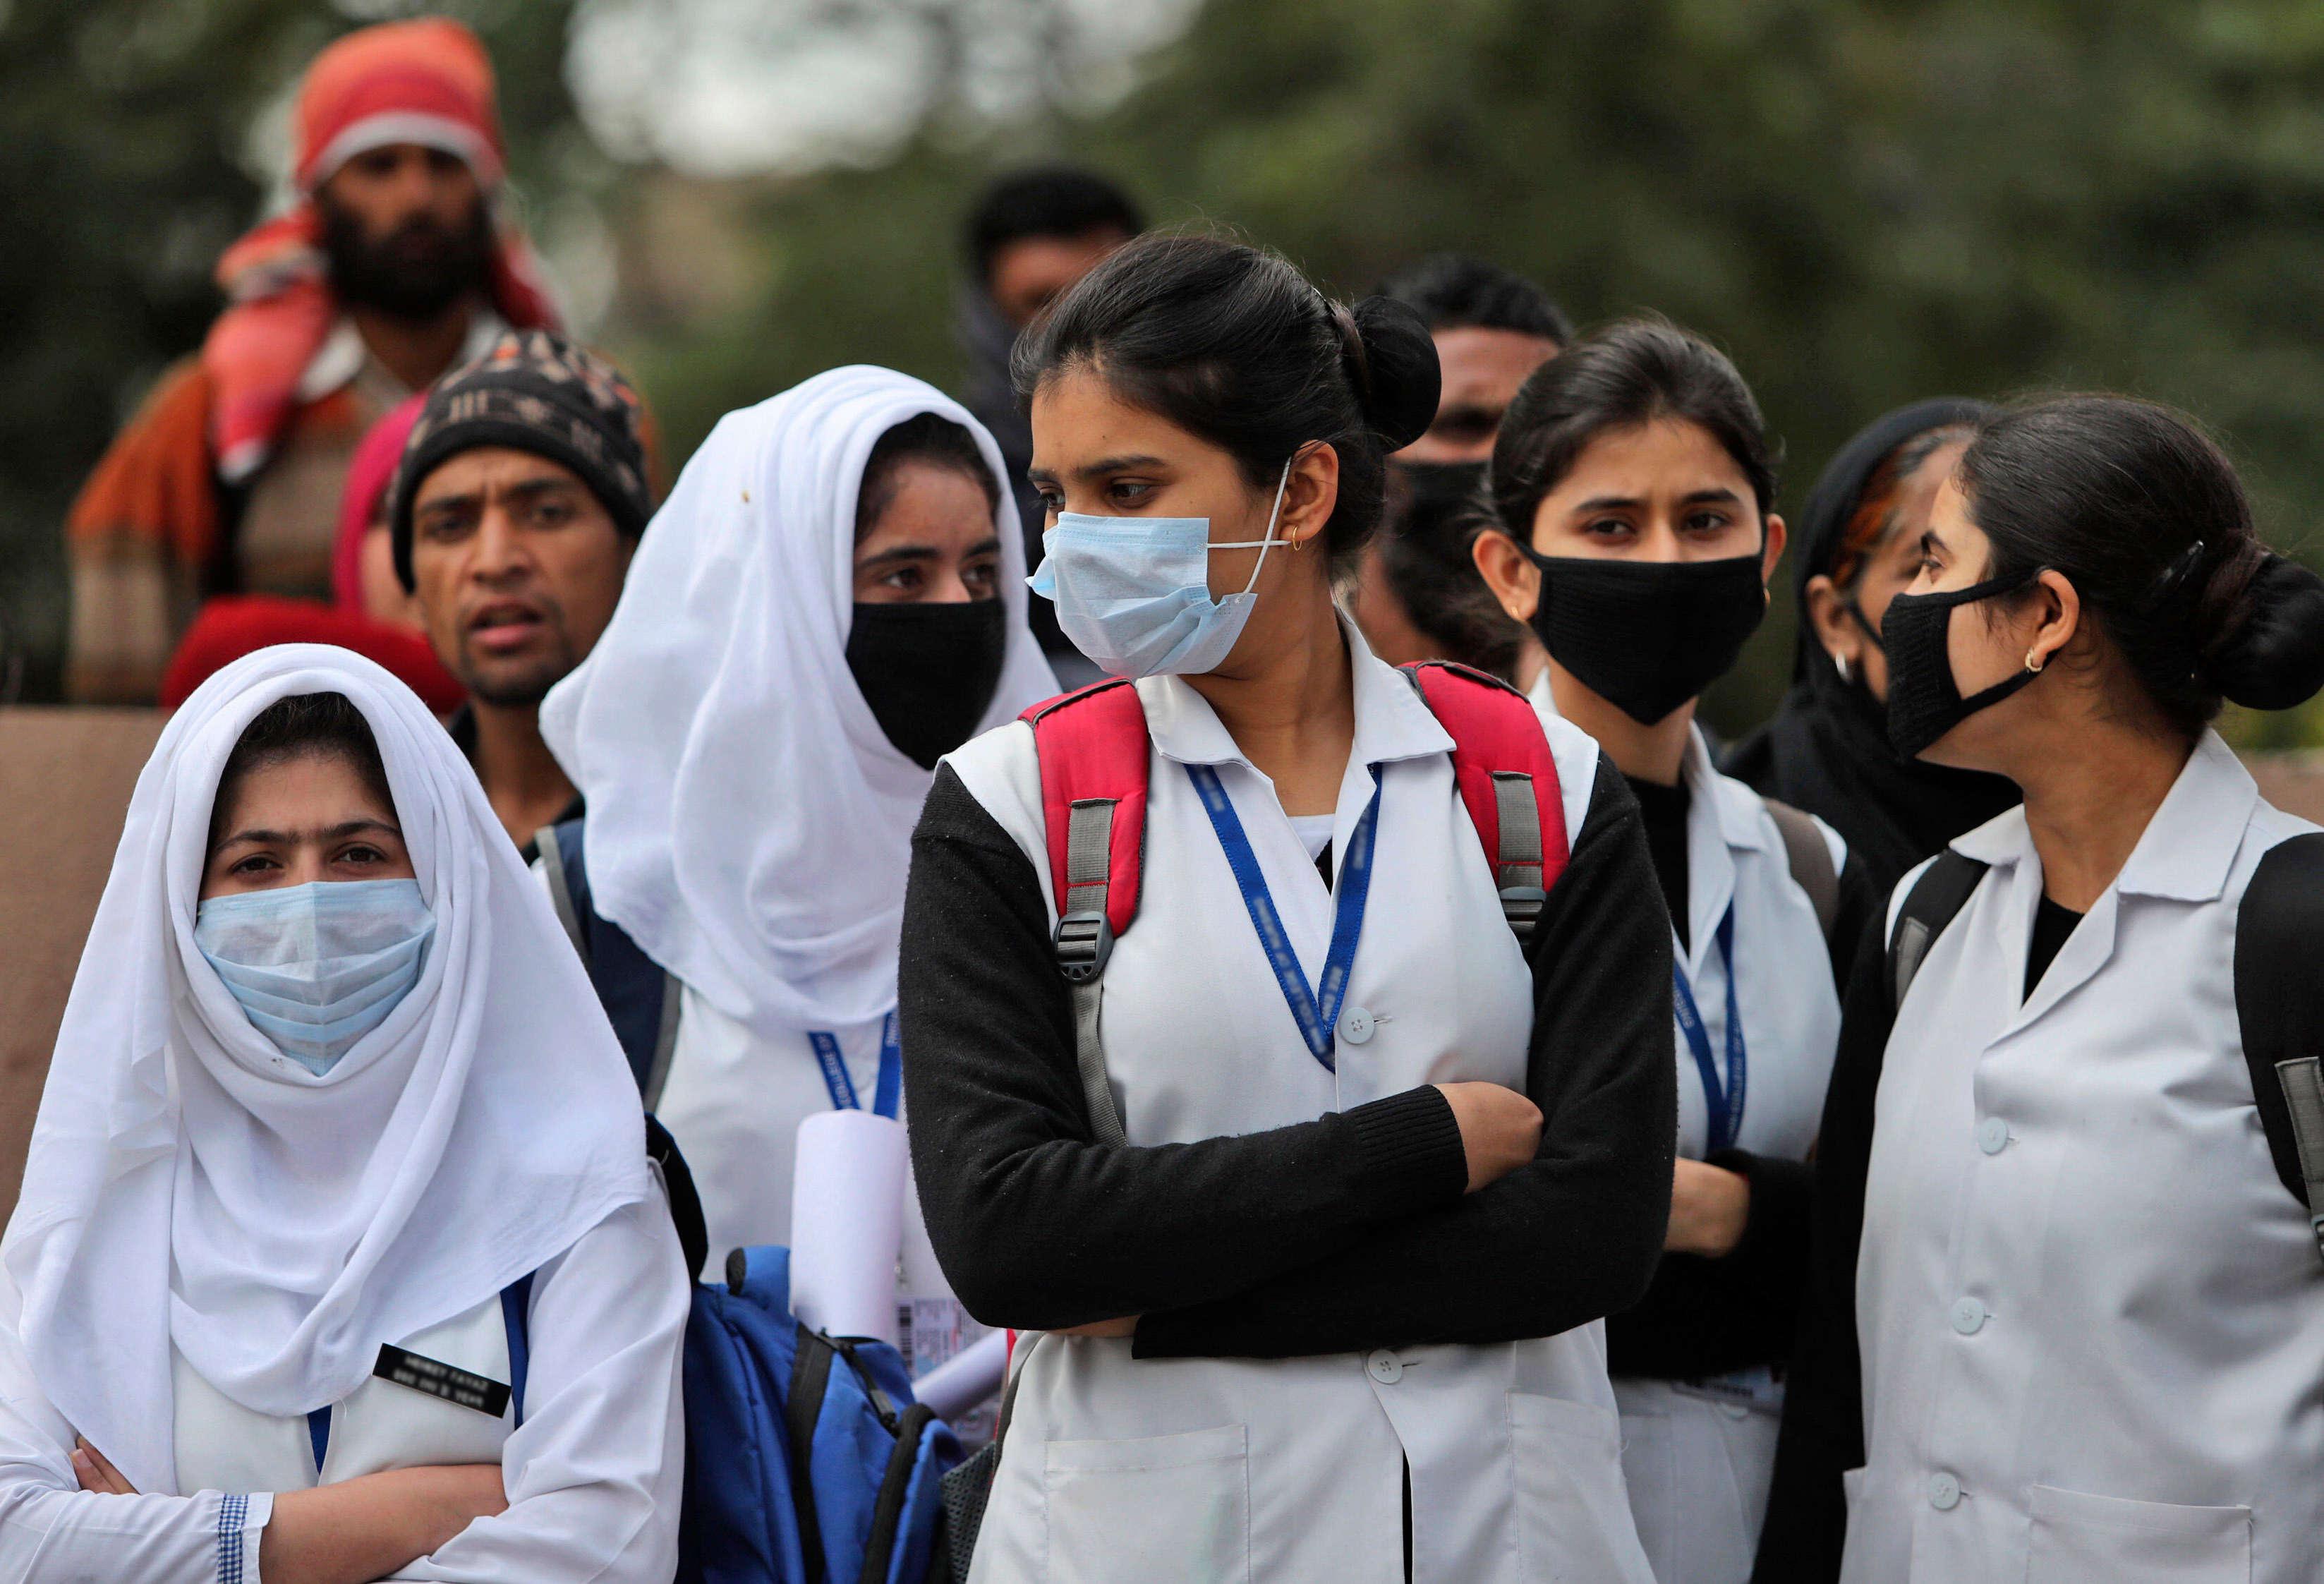 EdTech platforms go mainstream as educational institutes close due to coronavirus outbreak